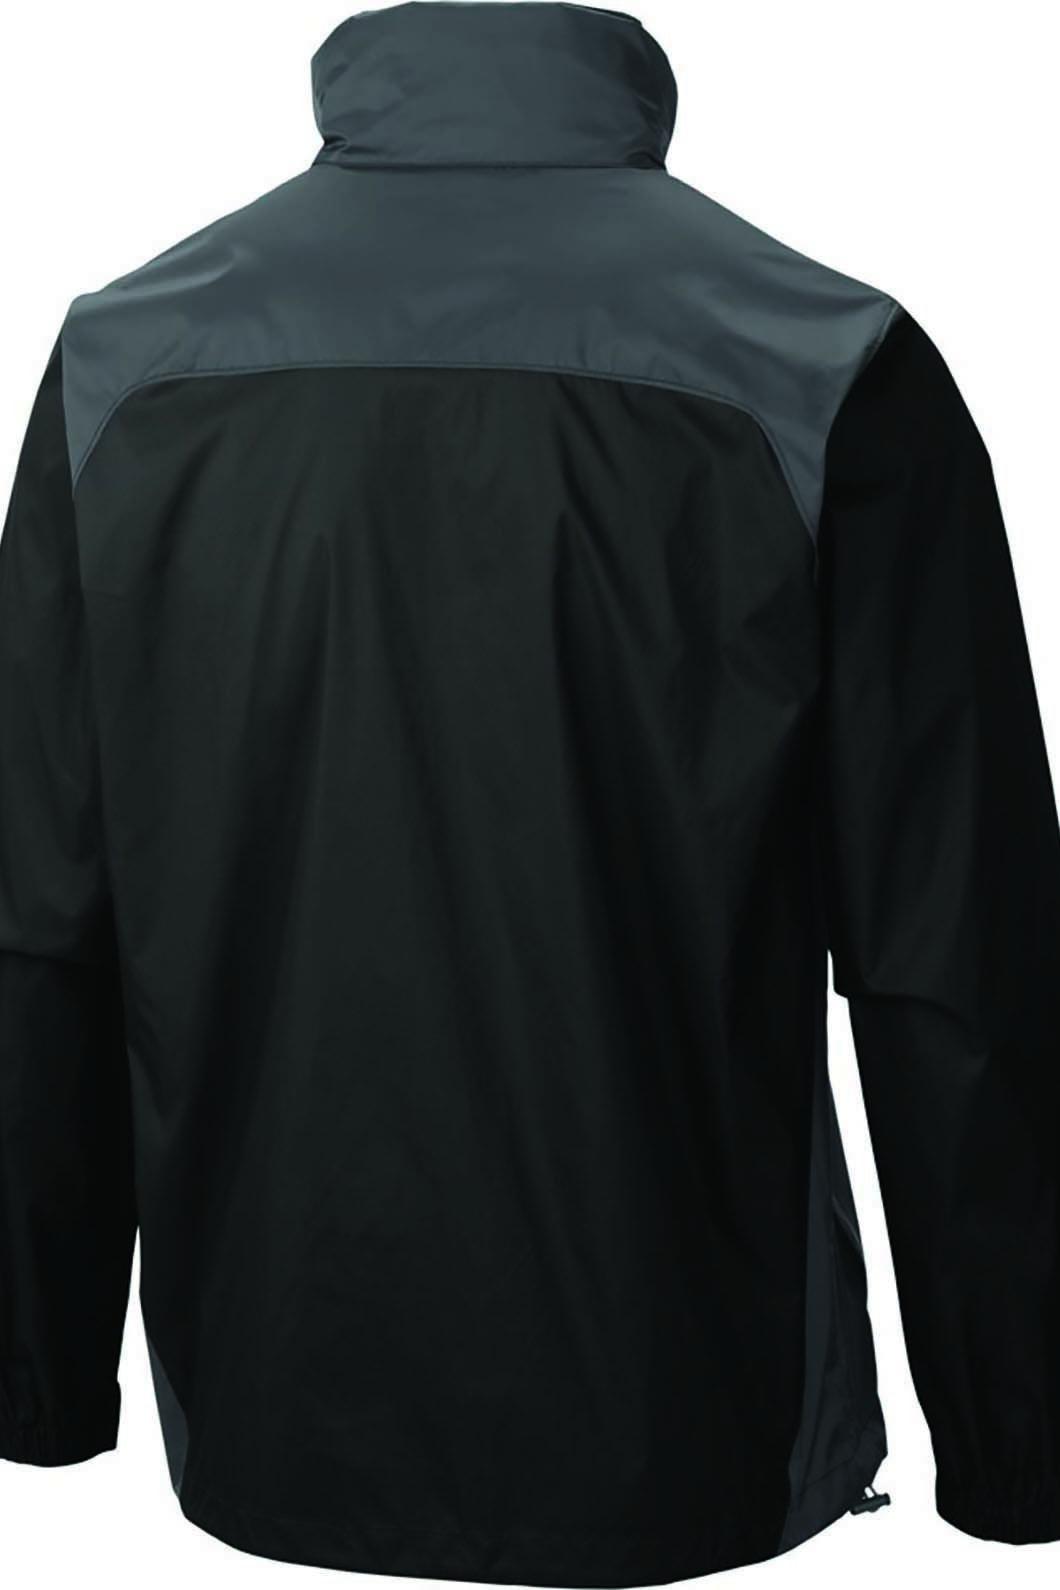 Columbia Men's Glennaker Jacket, DARK MOUNTAIN/COLLEGIATE NAVY, hi-res